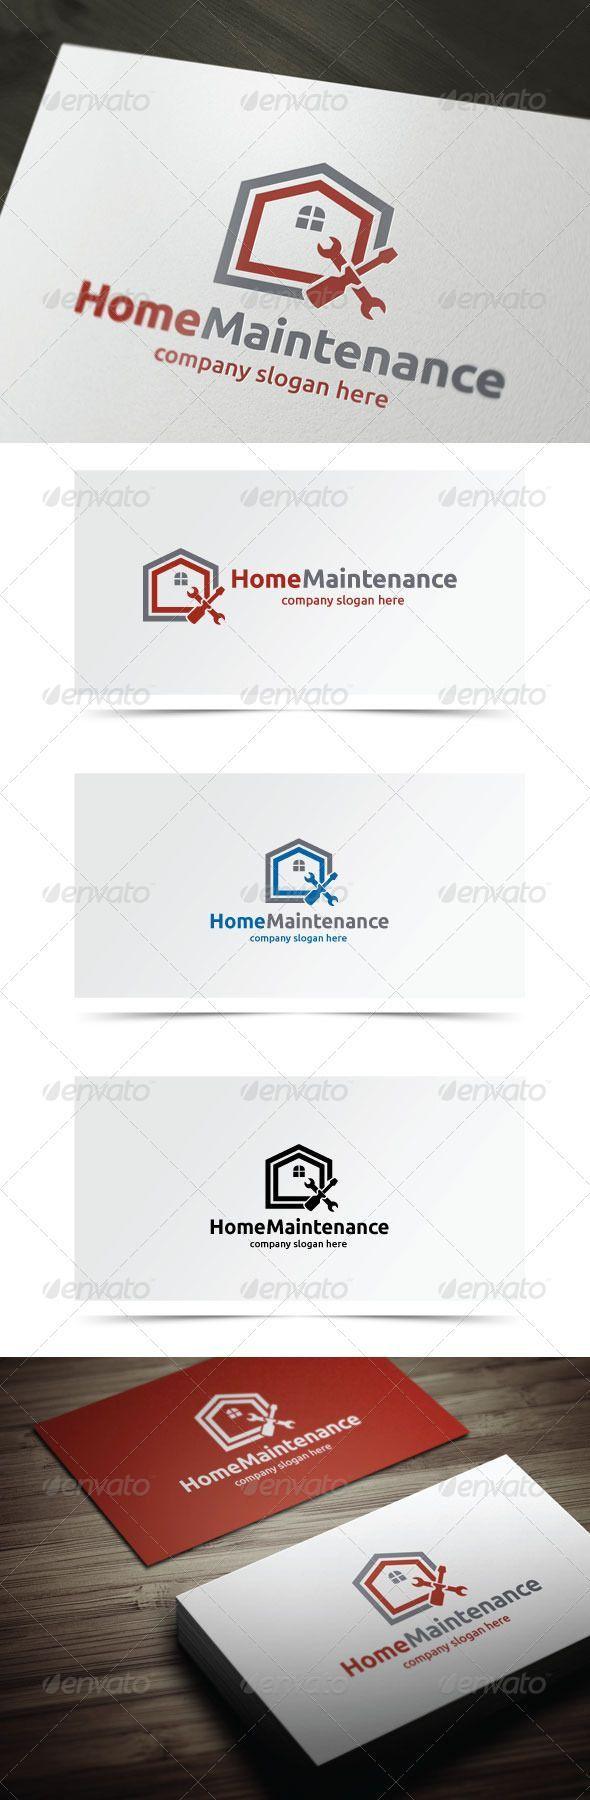 Home Maintenance Konstruktion Verlegenheit Reparatur Logo Vorlage Vector Logo Resizable Vorlagen Reparatur Logos